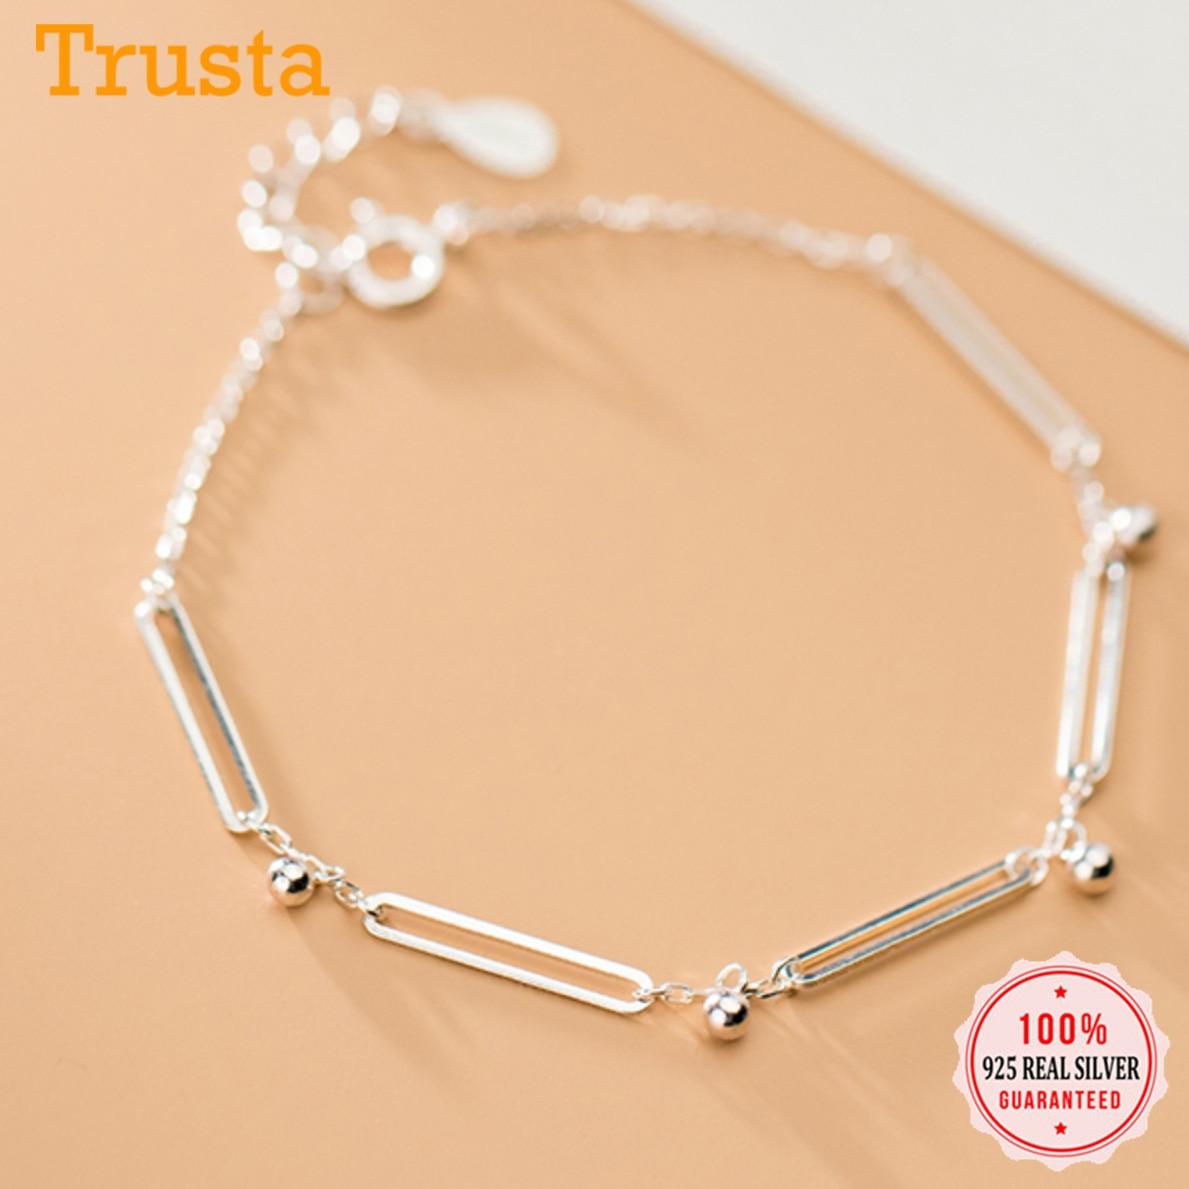 Trustdavis auténtica Plata de Ley 925 cuentas de moda geométrica brazalete rectangular para mujeres boda fina S925 joyería DA1086